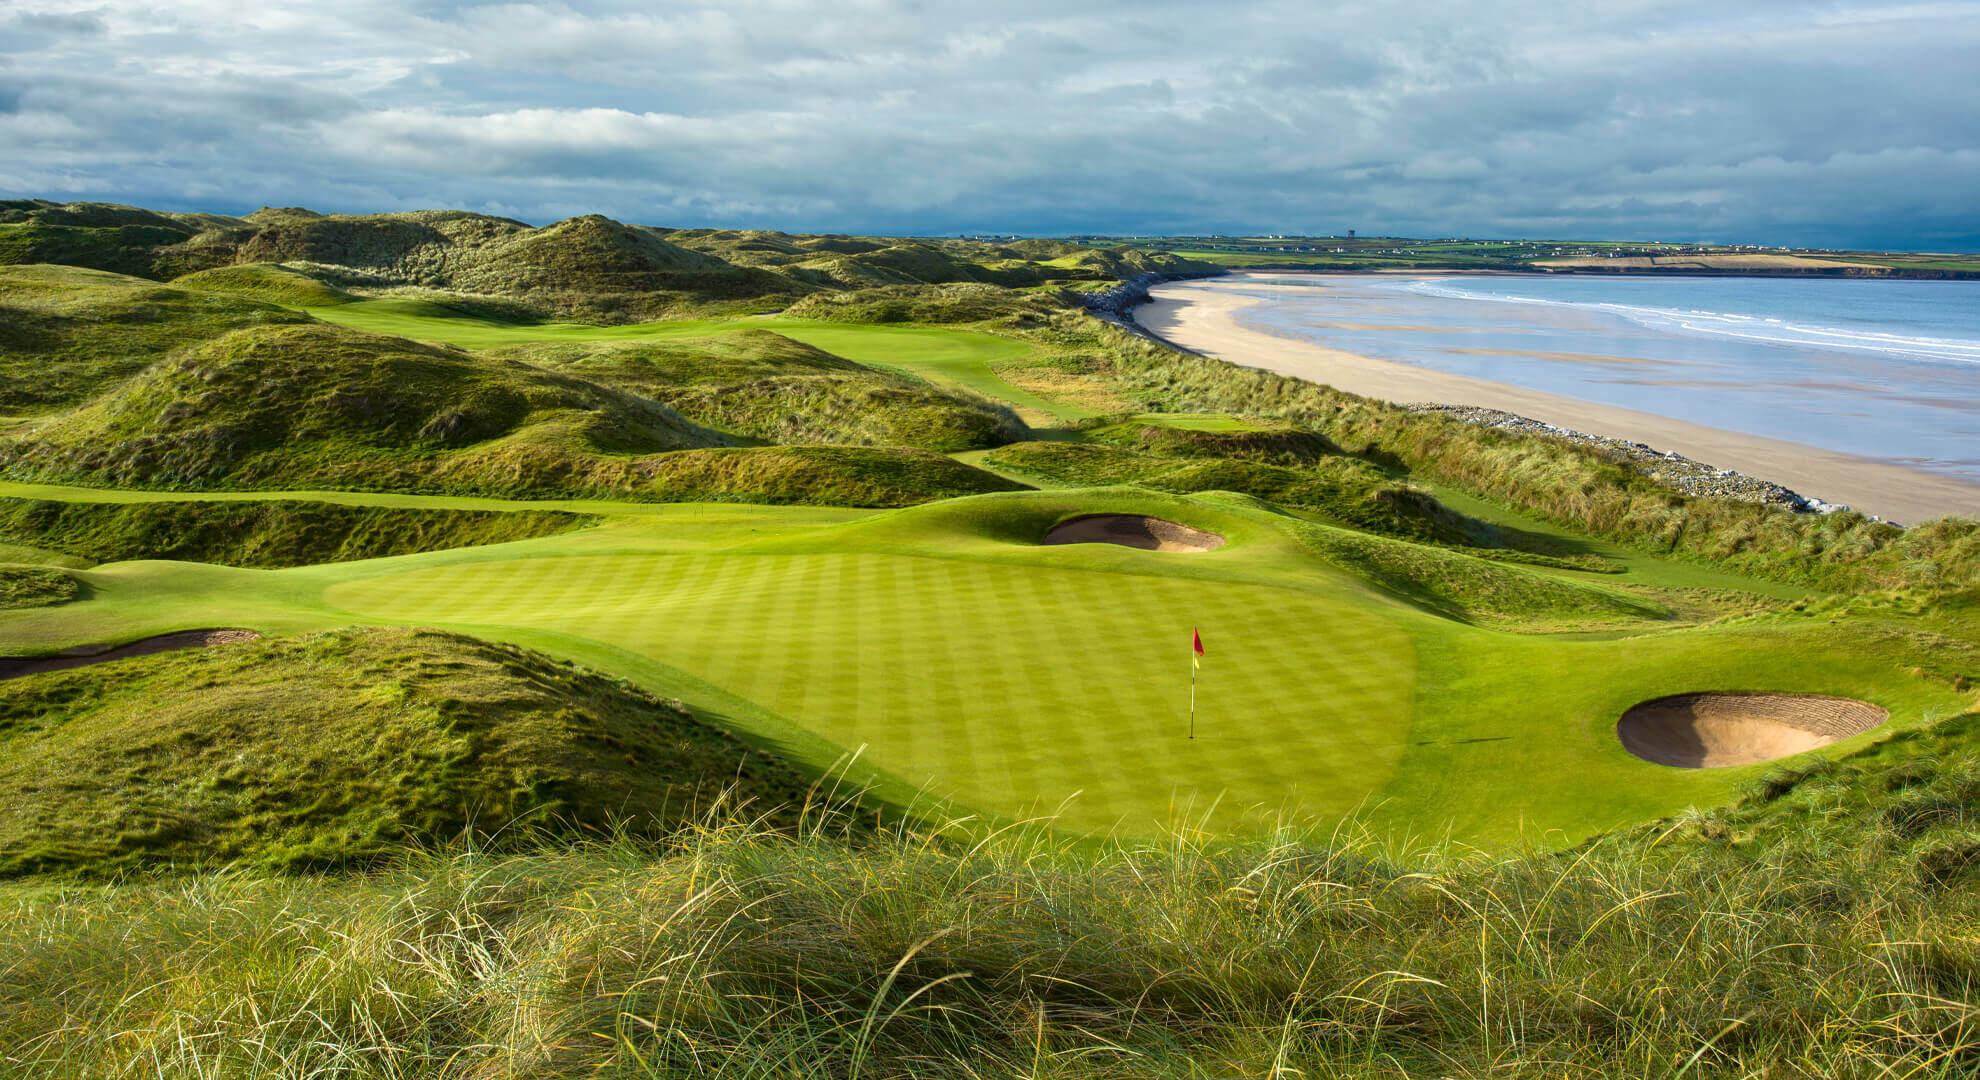 Ballybunion Old Golf Course, South West Ireland